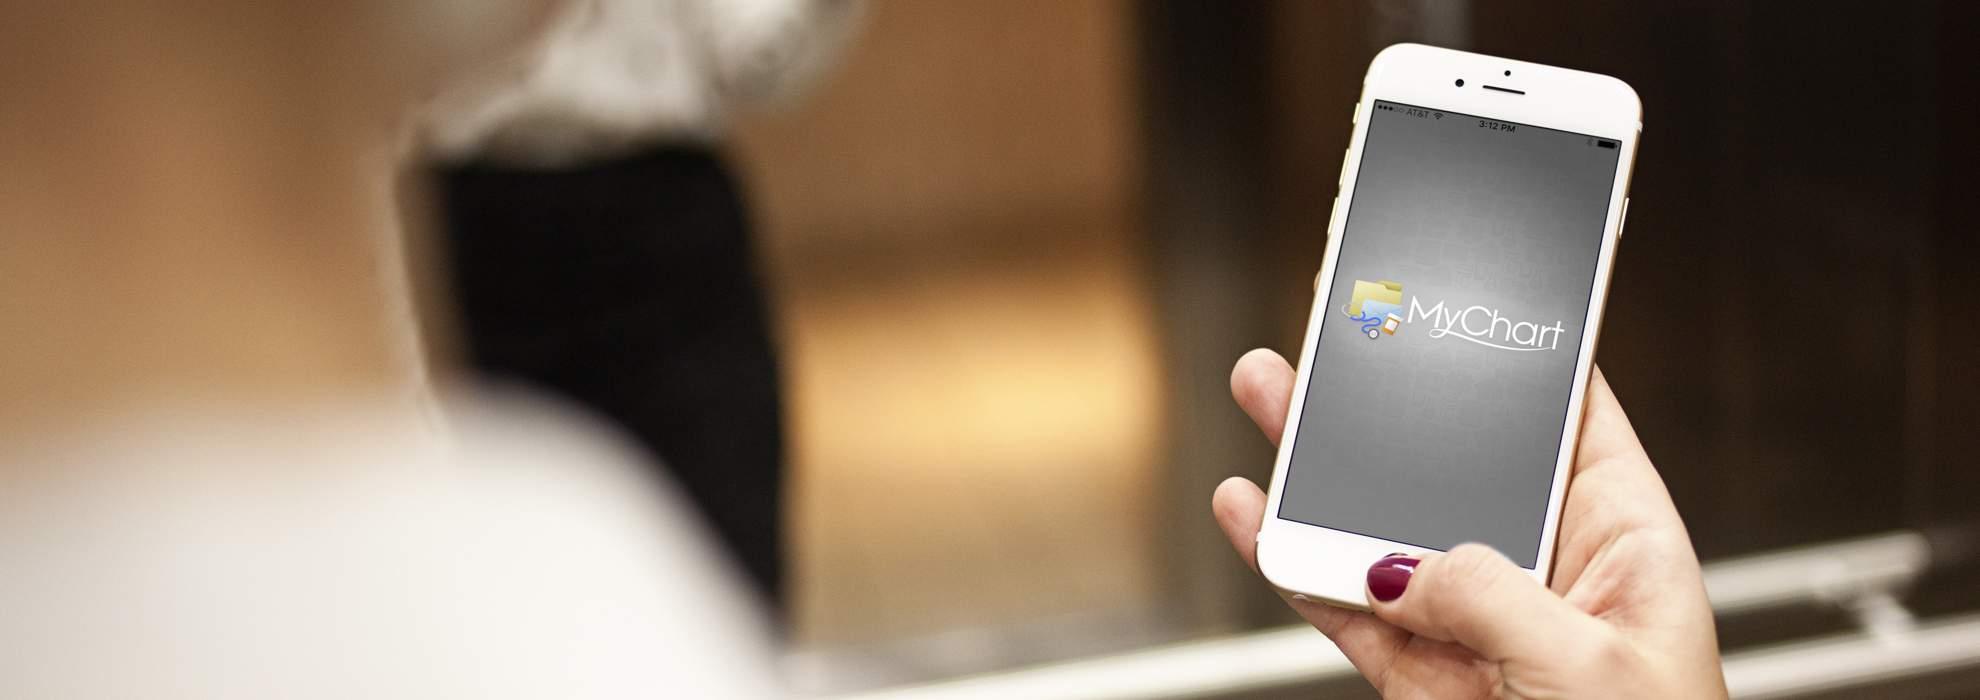 MyChart Mobile App F.A.Q.